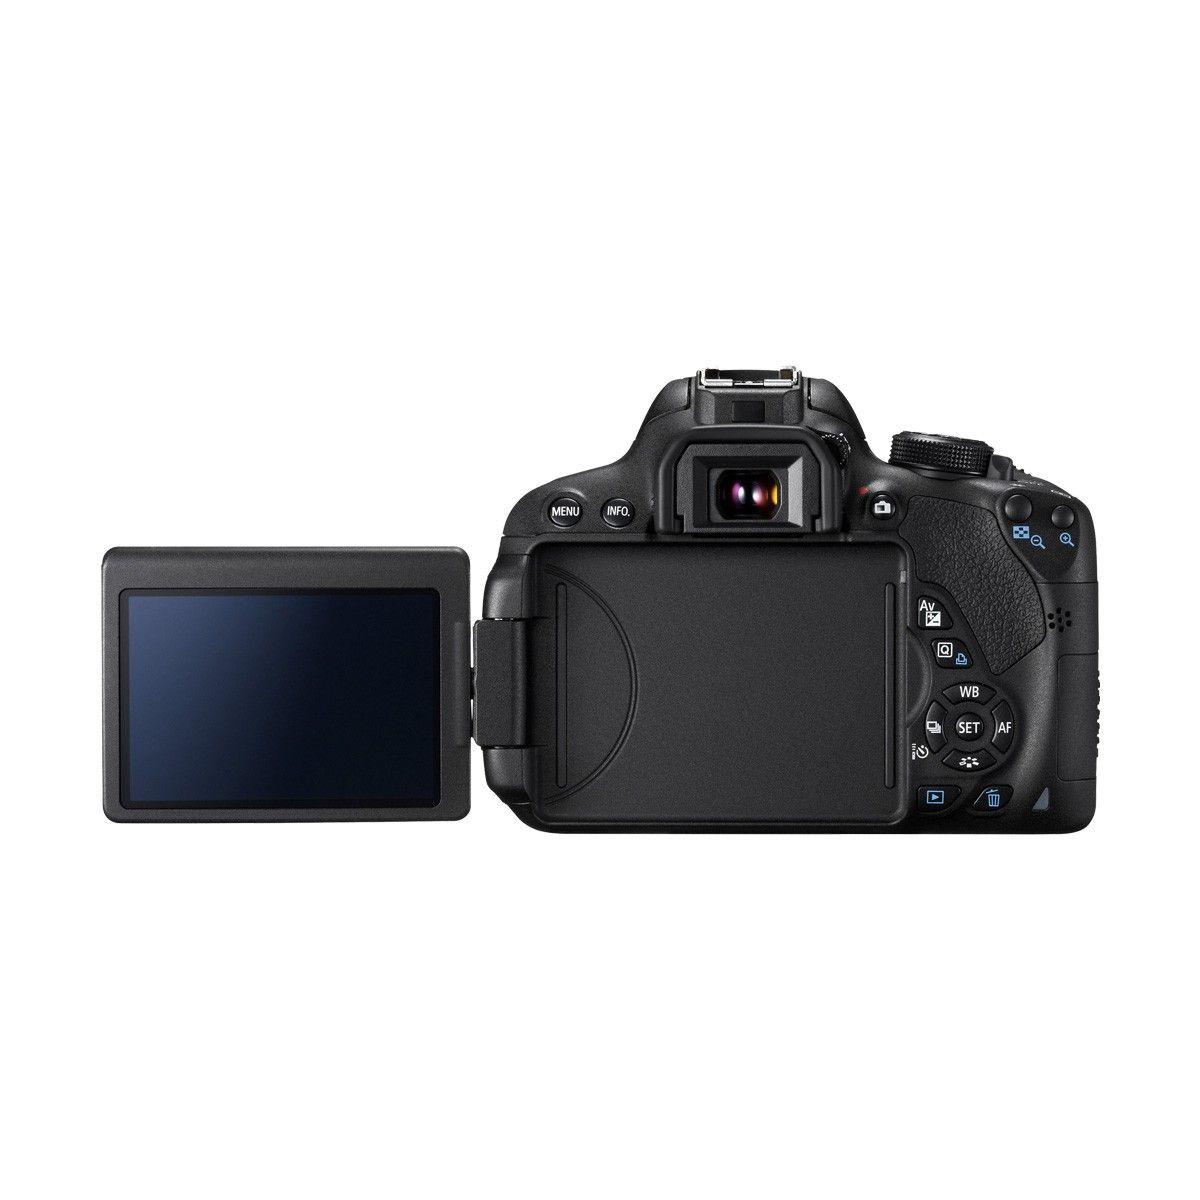 Canon Eos 700d Digital Slr Camera Body Spiegelreflexkamera Canon Eos Canon Kamera